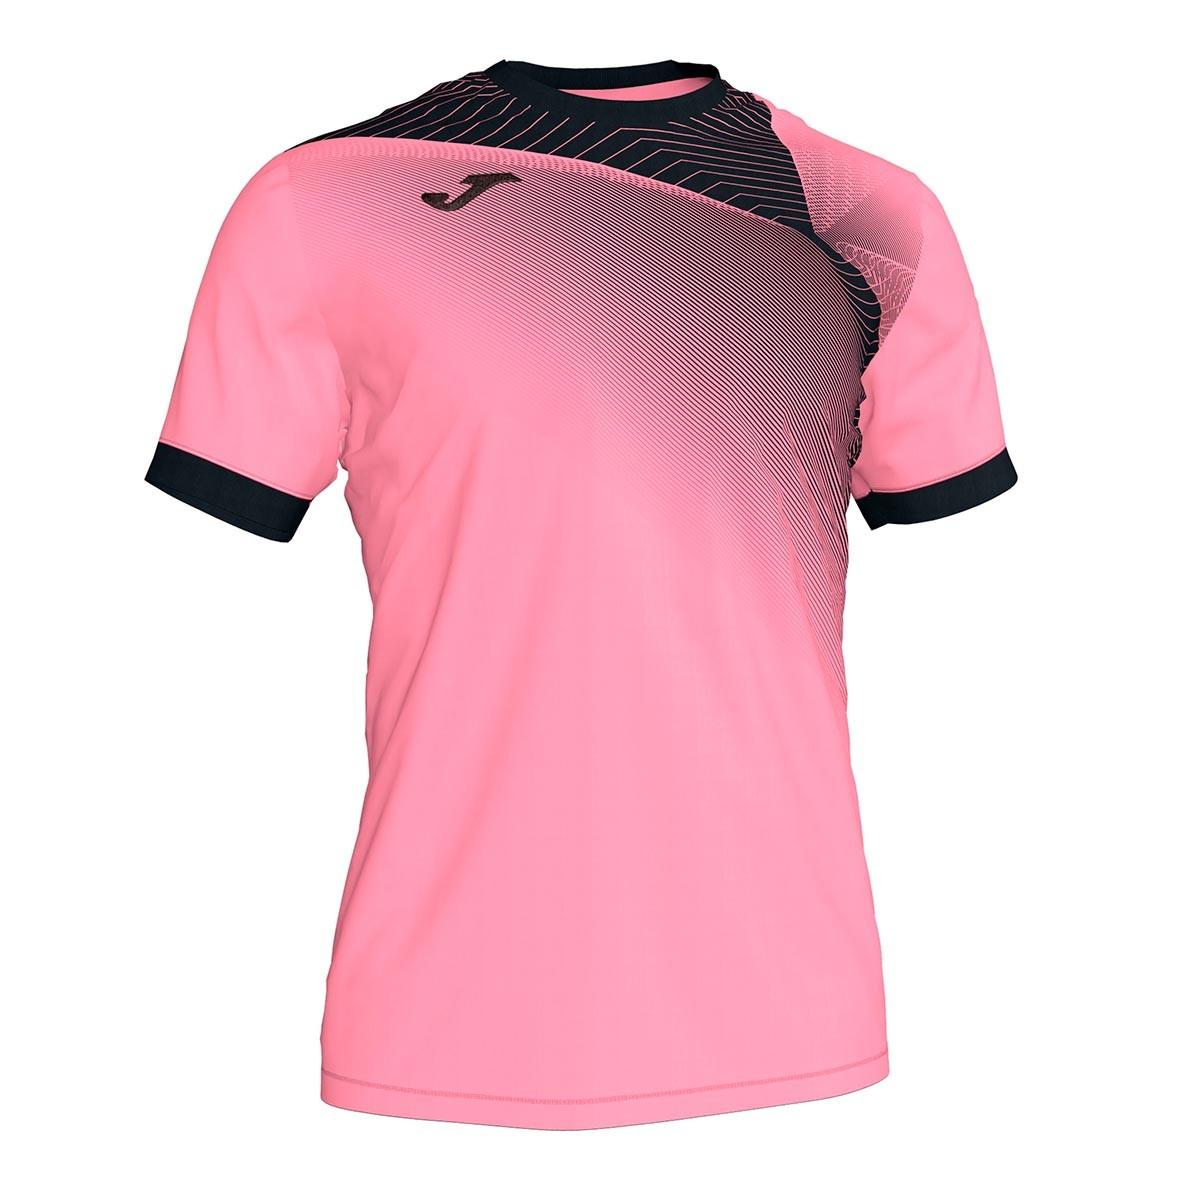 camiseta joma hispa ii m c rosa negro tienda de futbol futbol emotion camiseta joma hispa ii m c